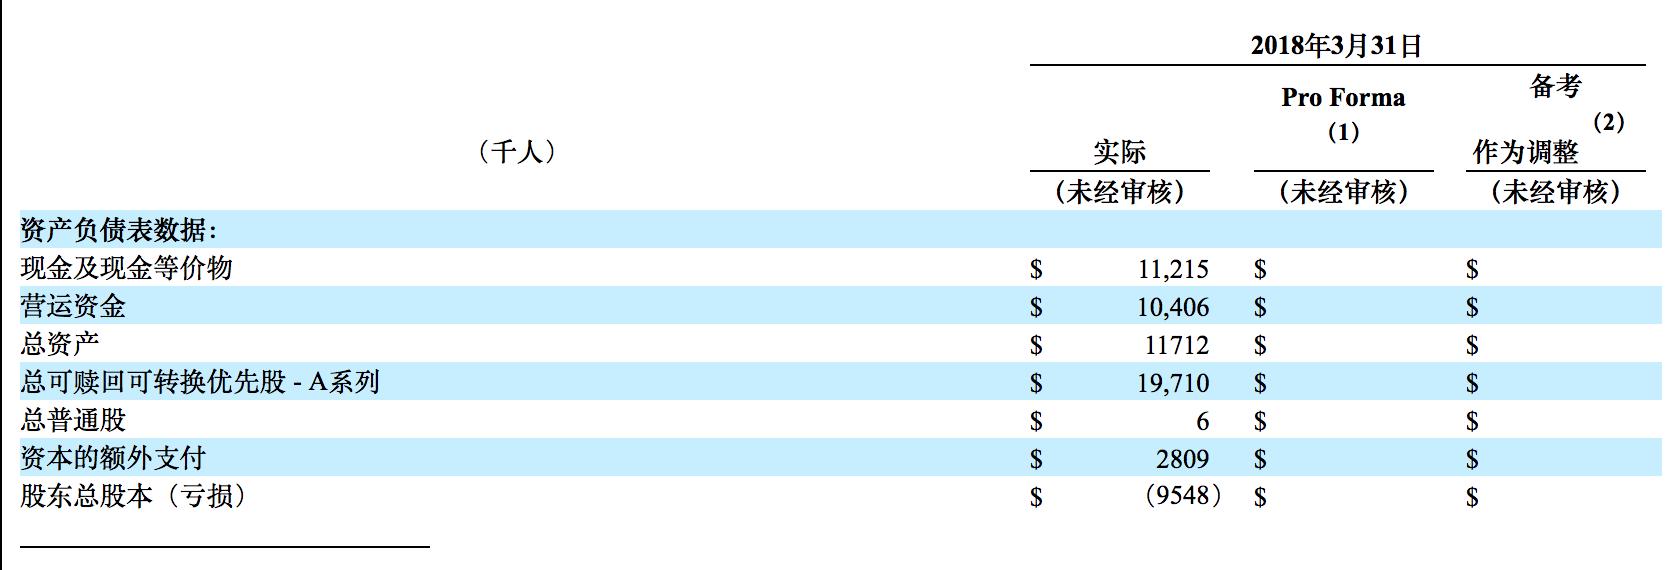 Eton Pharmaceuticals,Inc 美股IPO - 如何购买美股